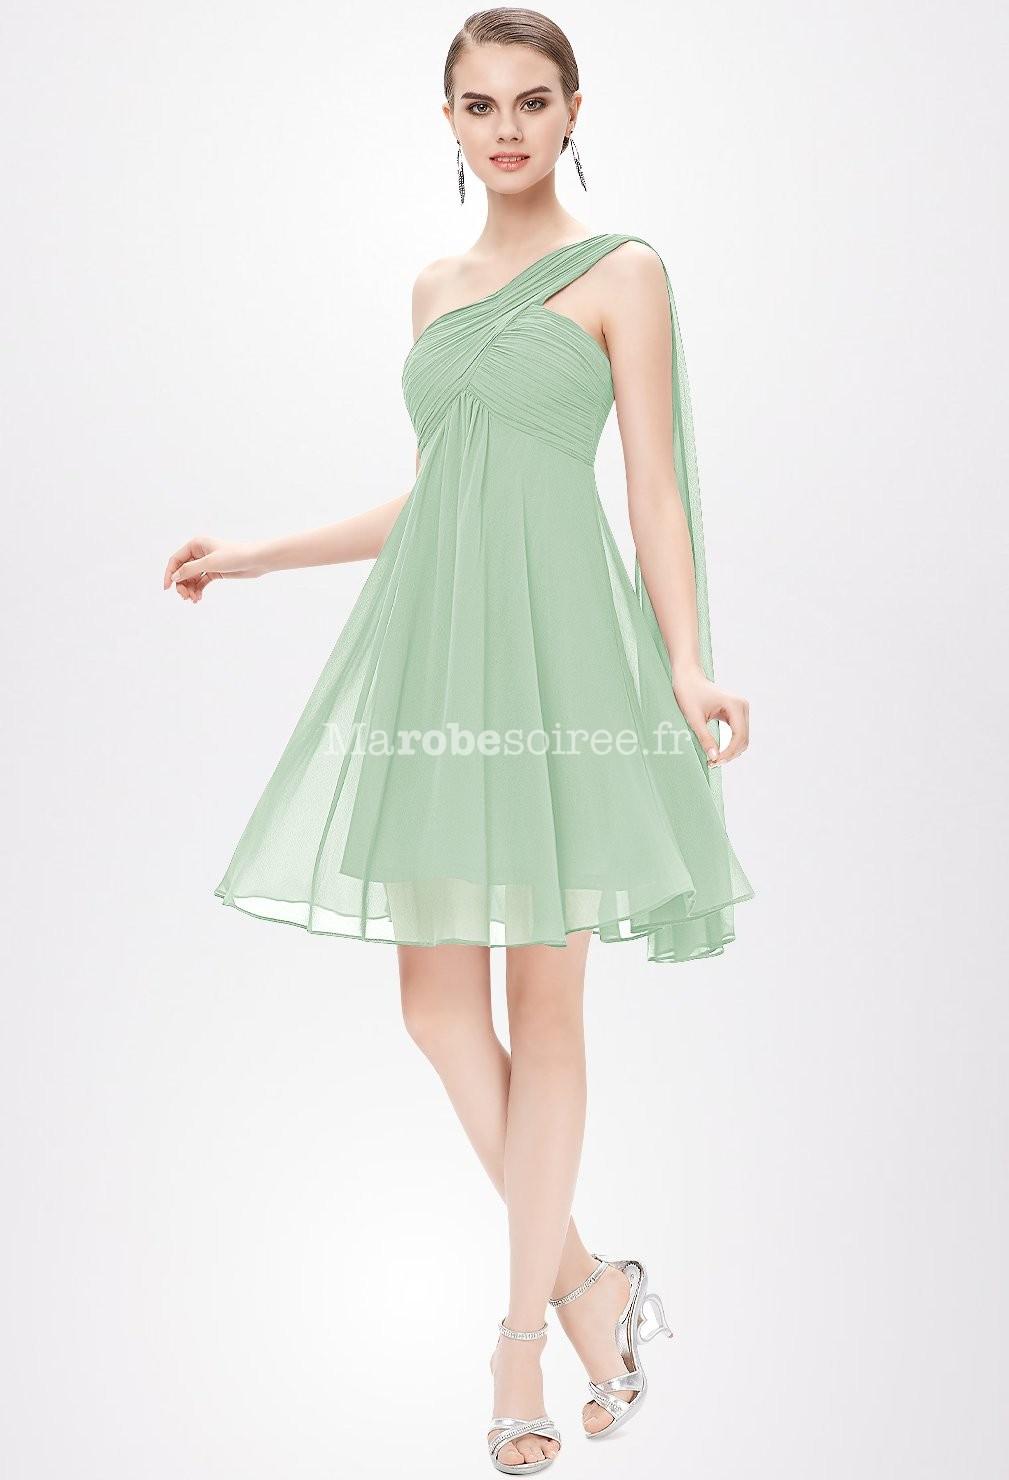 Model de robe courte chic